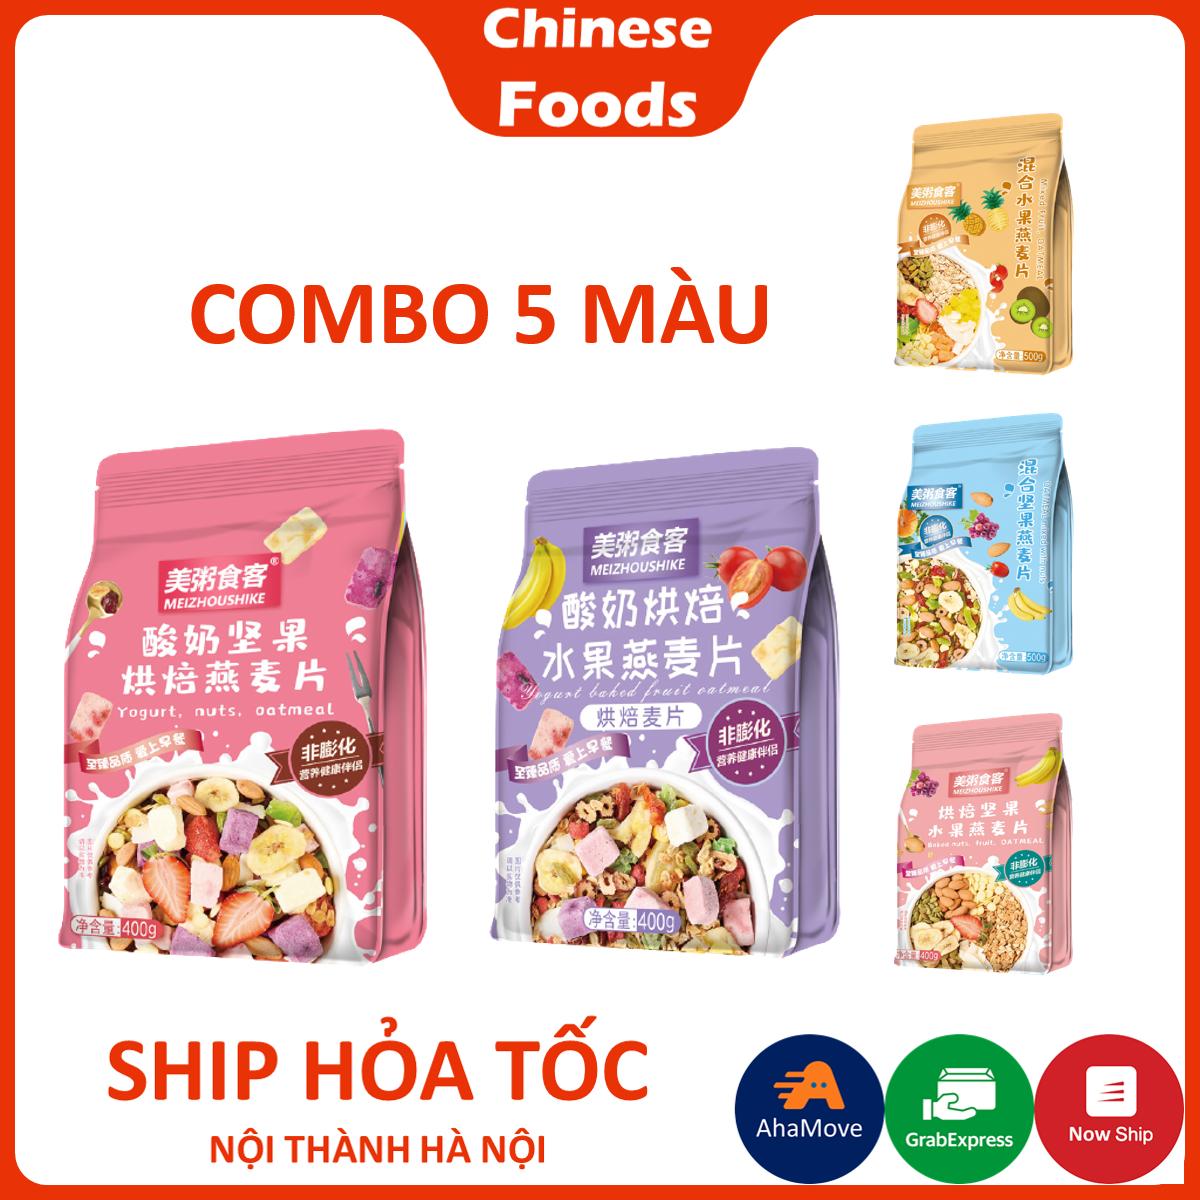 Cocmbo 5 Màu Ngũ Cốc Sữa Chua Hoa Quả Giảm Cân Meizhoushike 400 – 500g